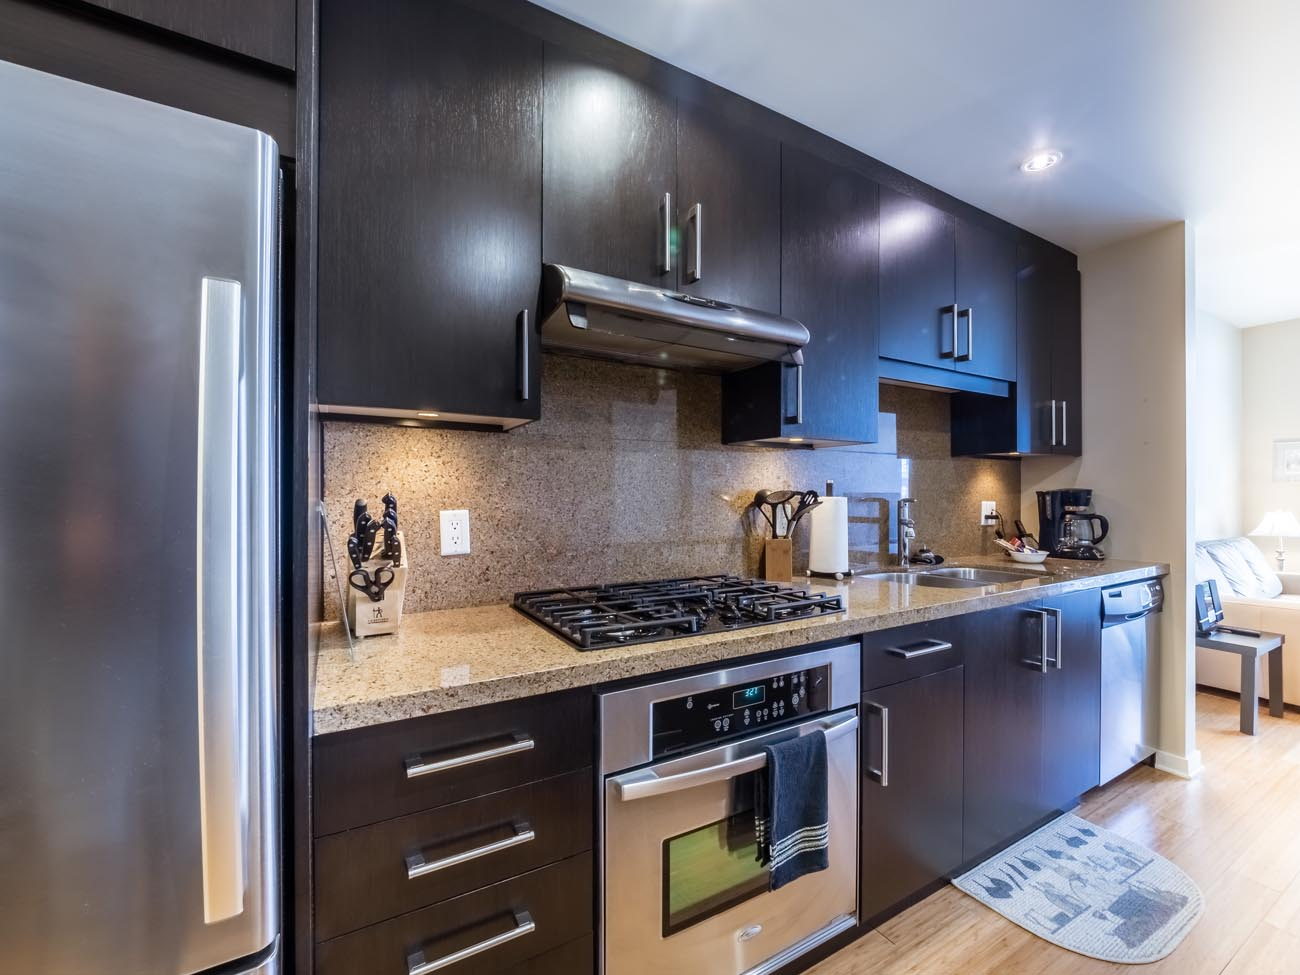 condo kitchen stainless steel appliances